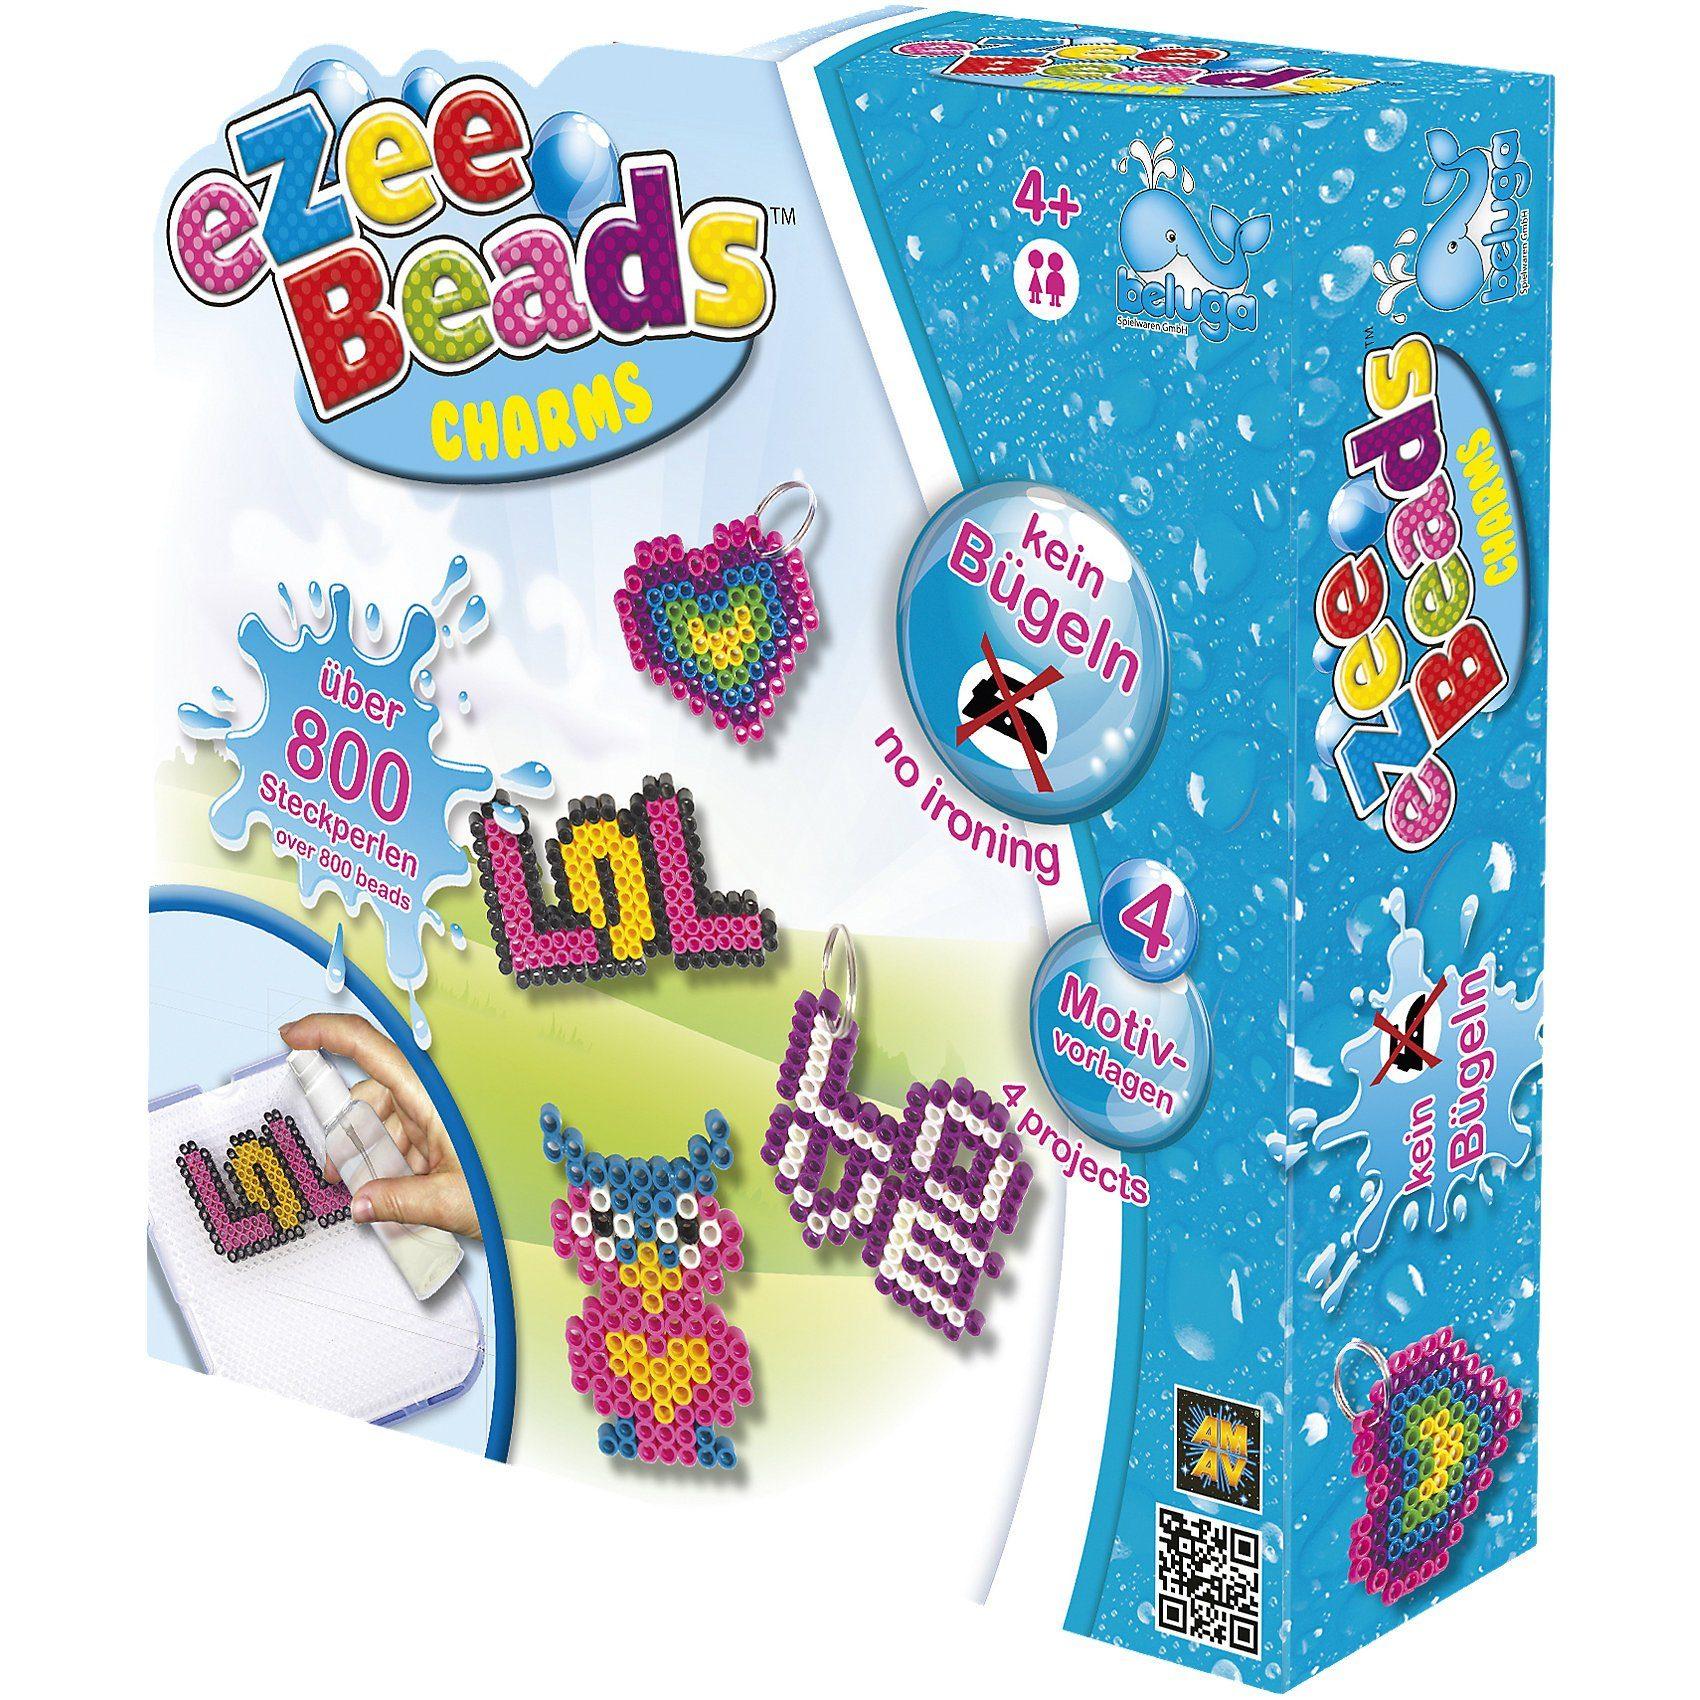 Beluga eZee Beads Sprühperlen Charms, ca. 800 Perlen